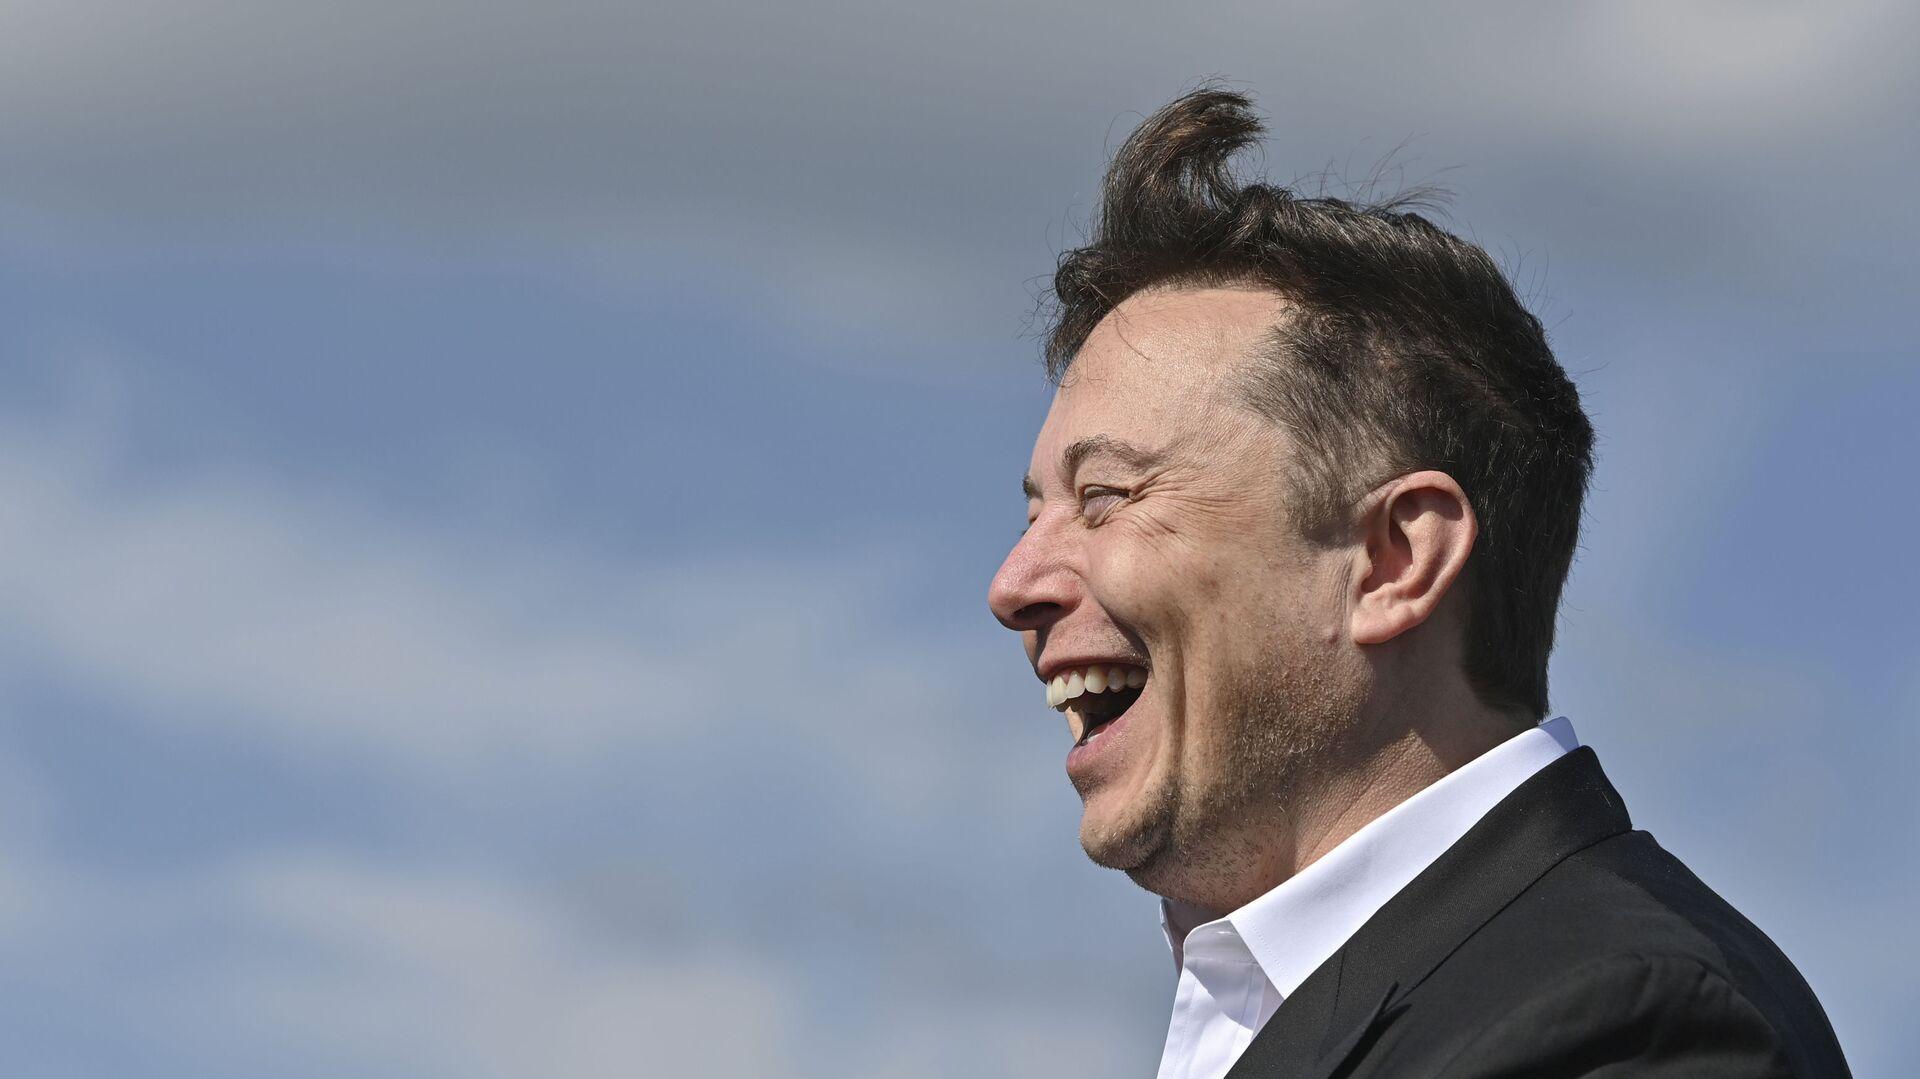 Technology entrepreneur Elon Musk laughs as he visits the Tesla Gigafactory construction site in Gruenheide near Berlin, Germany, Sept. 3, 2020. - Sputnik Italia, 1920, 09.05.2021